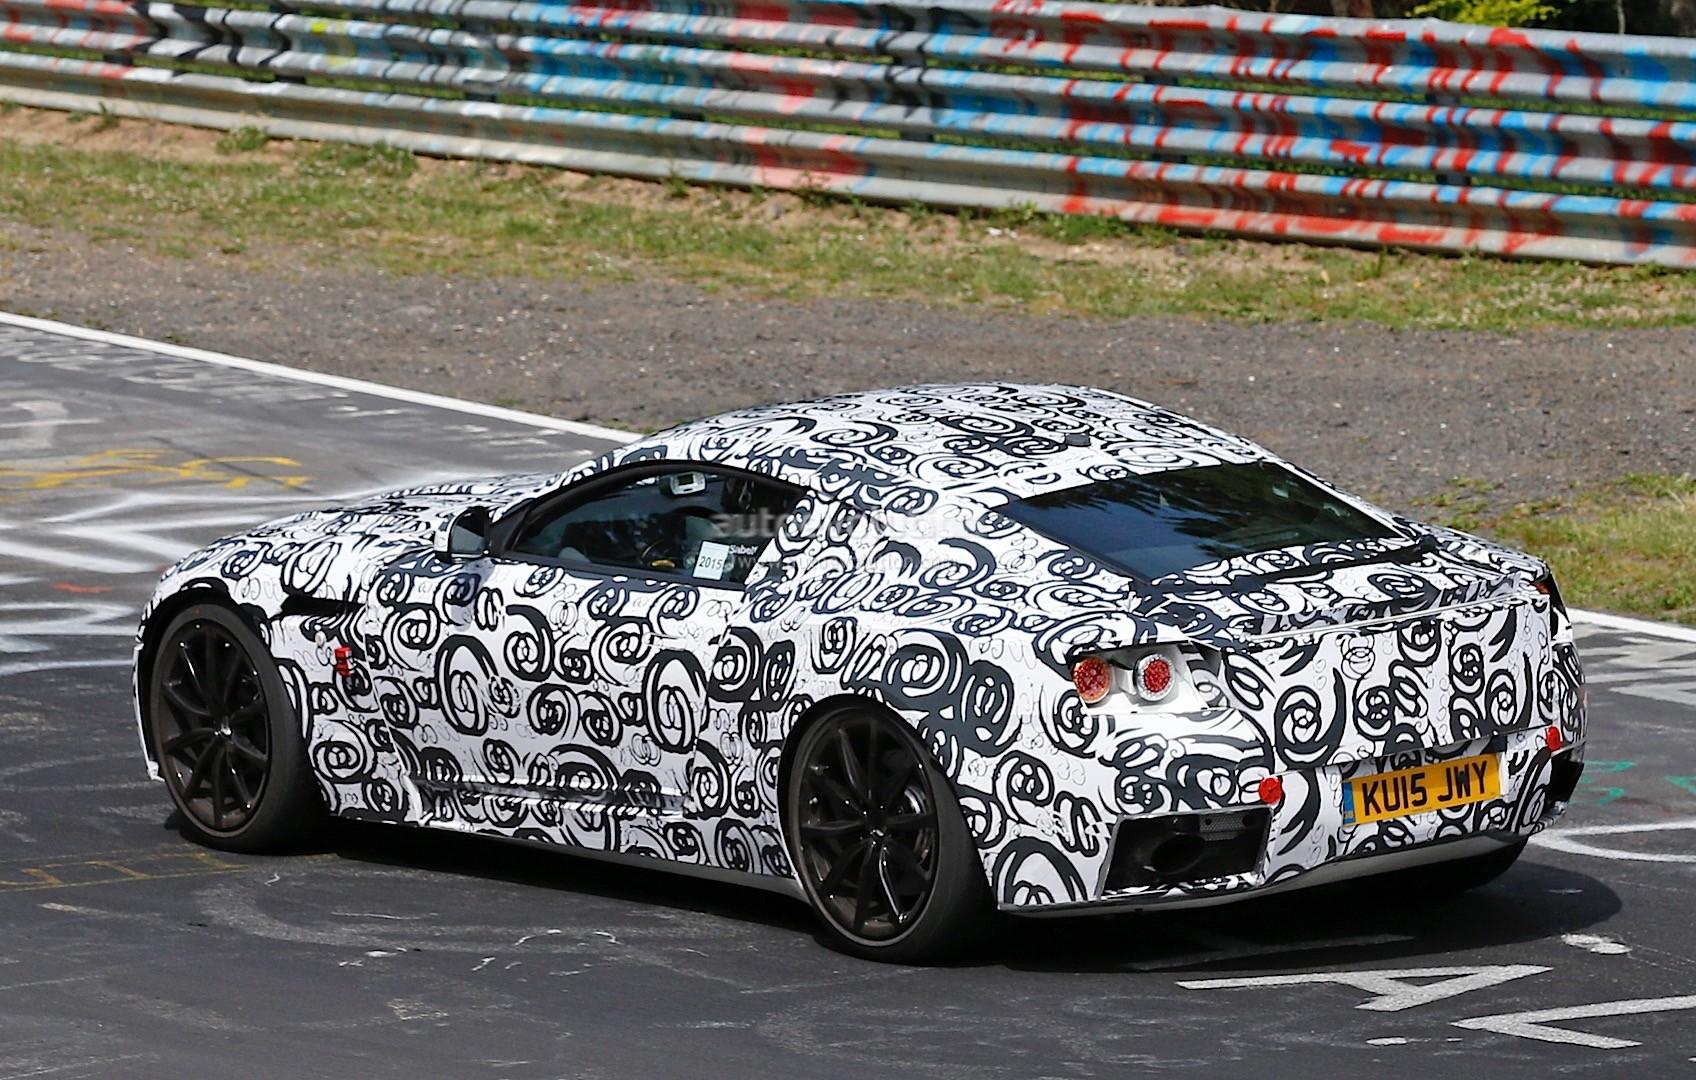 2016 - [Aston Martin] DB11 New-aston-martin-db11-prototype-looks-like-a-work-in-progress-photo-gallery_9